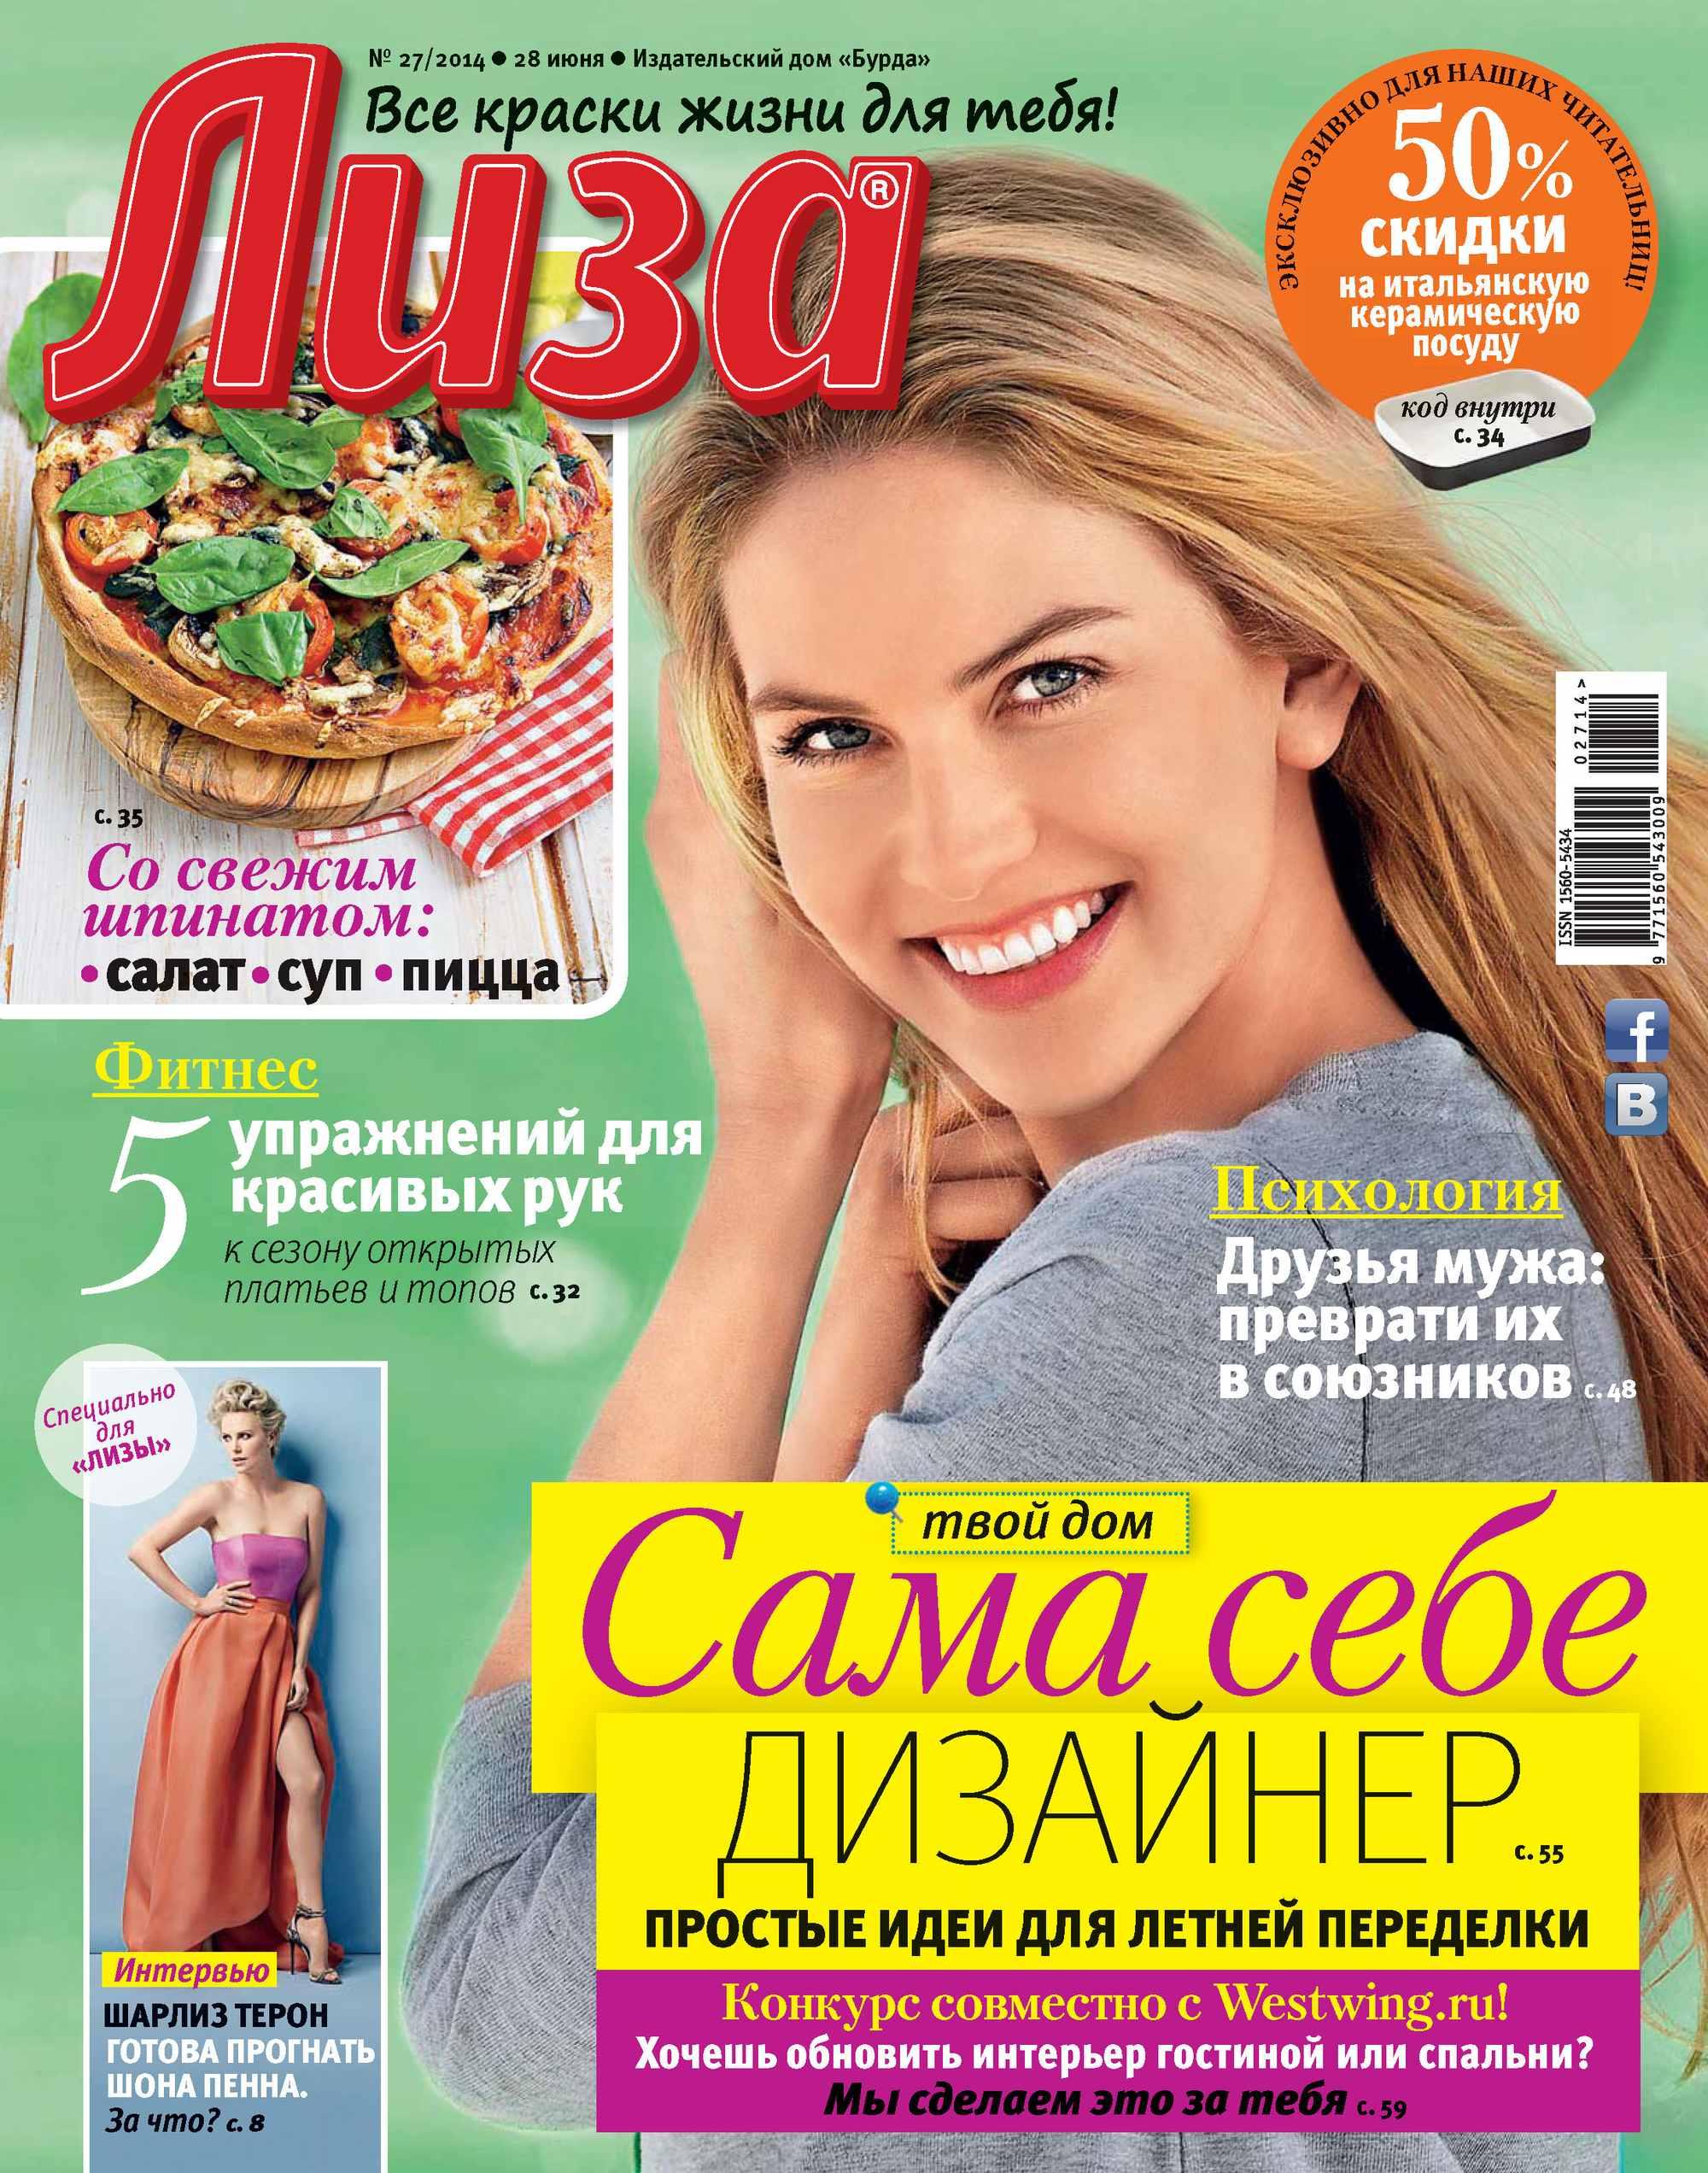 ИД «Бурда» Журнал «Лиза» №27/2014 журнал лиза бурда